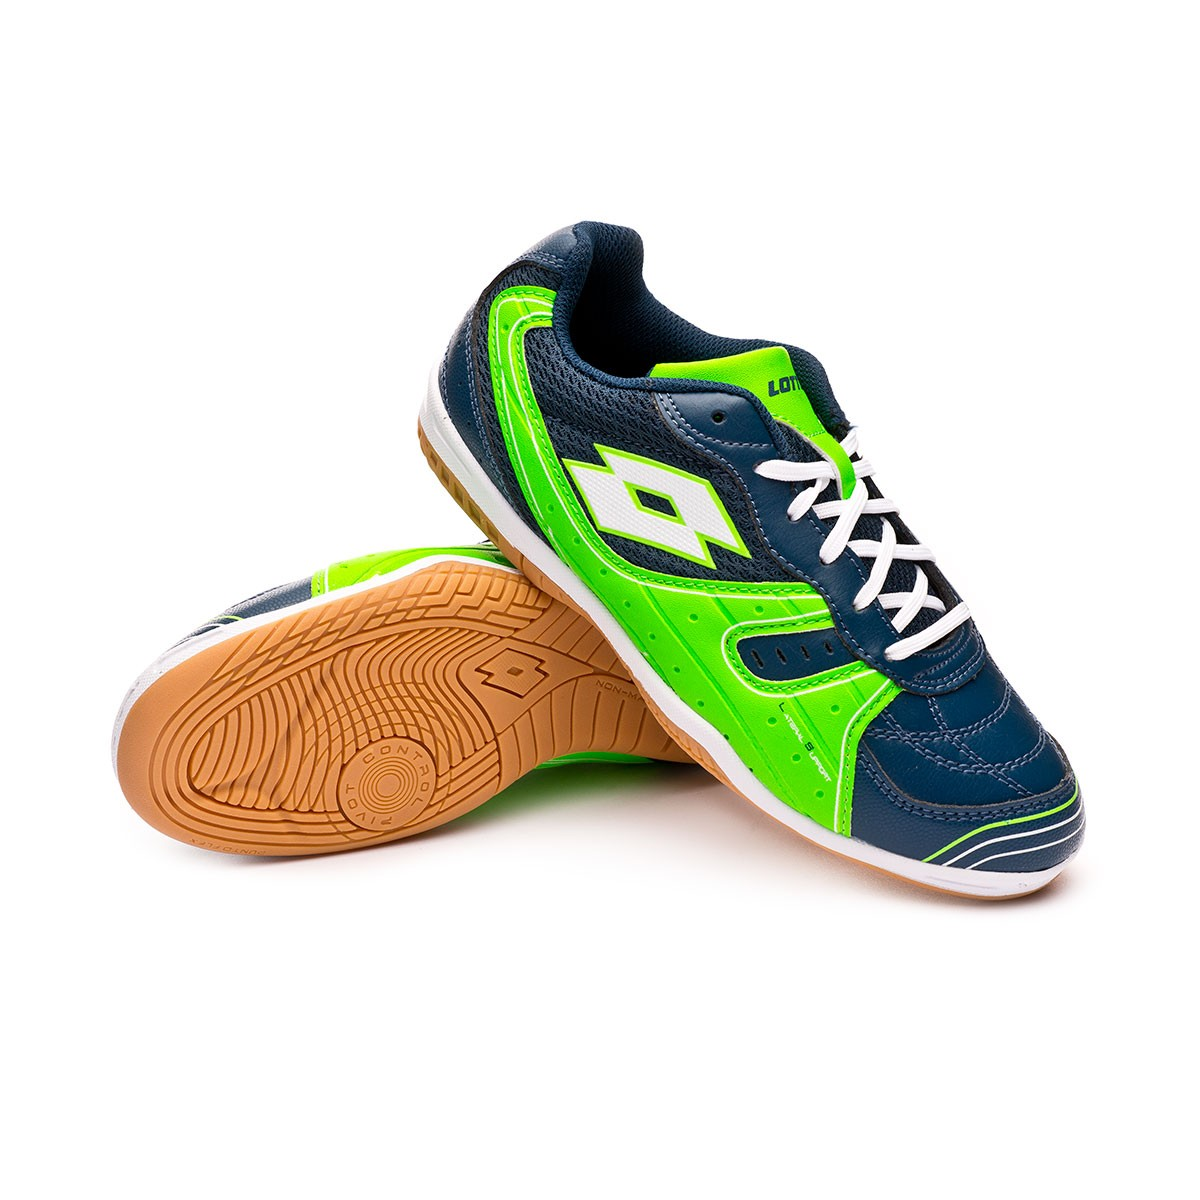 c8371f5ce Futsal Boot Lotto Kids Tacto 500 III ID Blue city-White - Football store  Fútbol Emotion